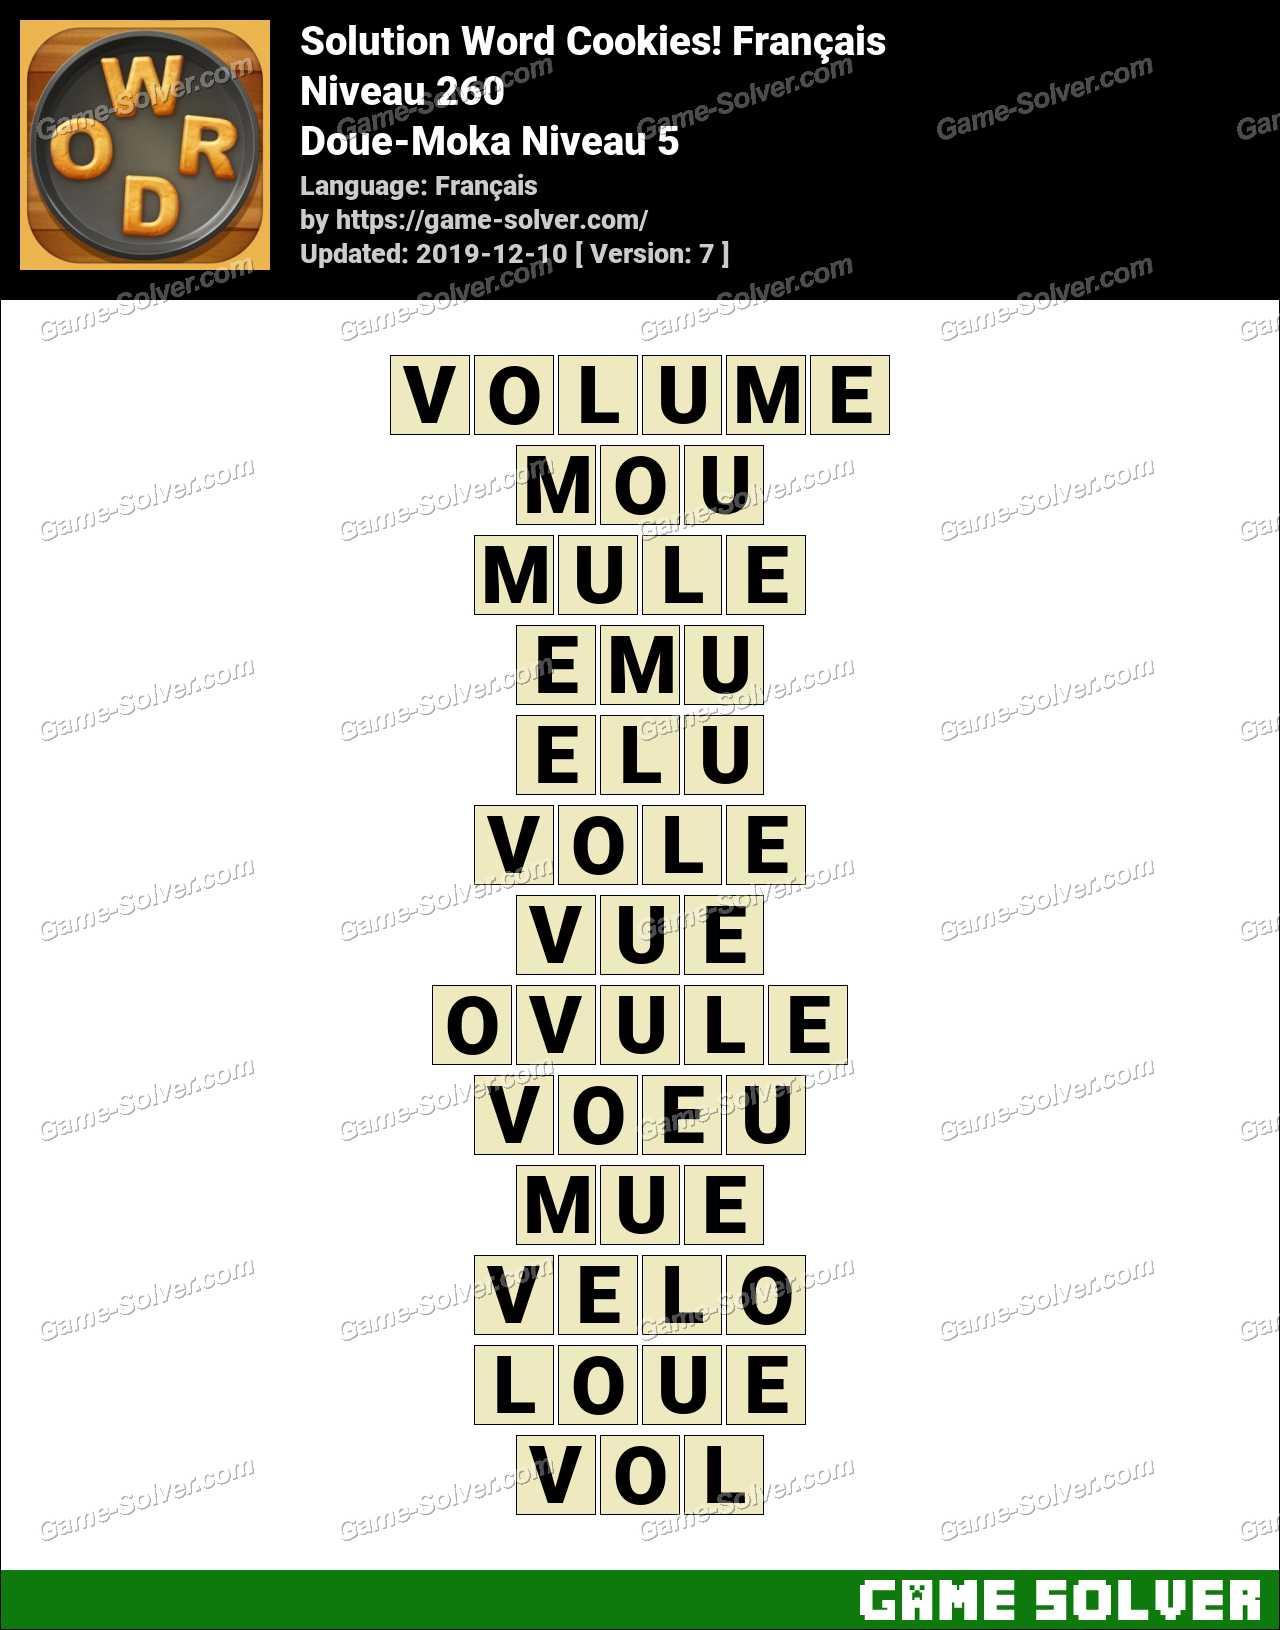 Solution Word Cookies Doue-Moka Niveau 5